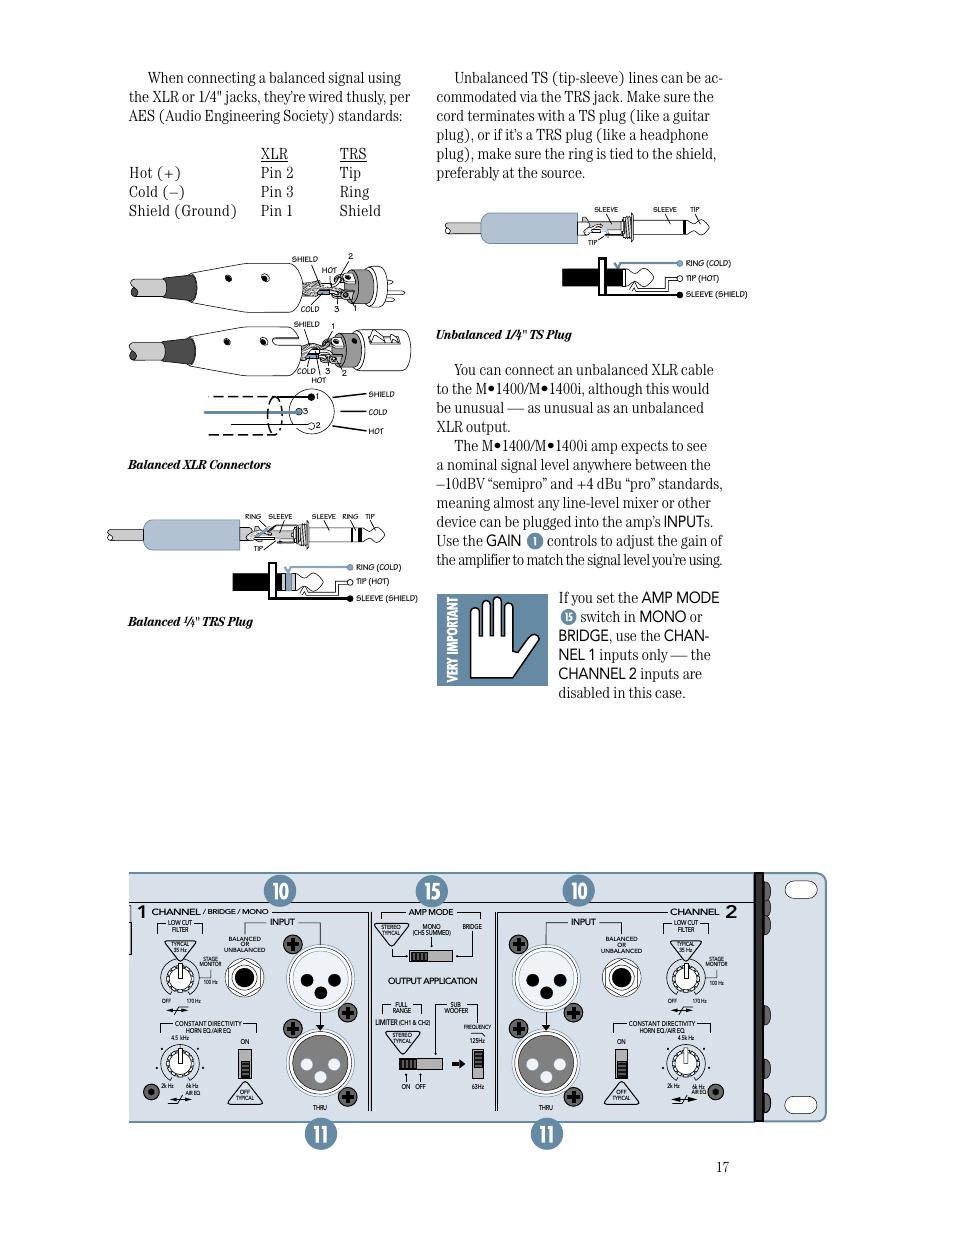 medium resolution of speaker outputs unbalanced 1 4 ts plug balanced xlr connectors balanced